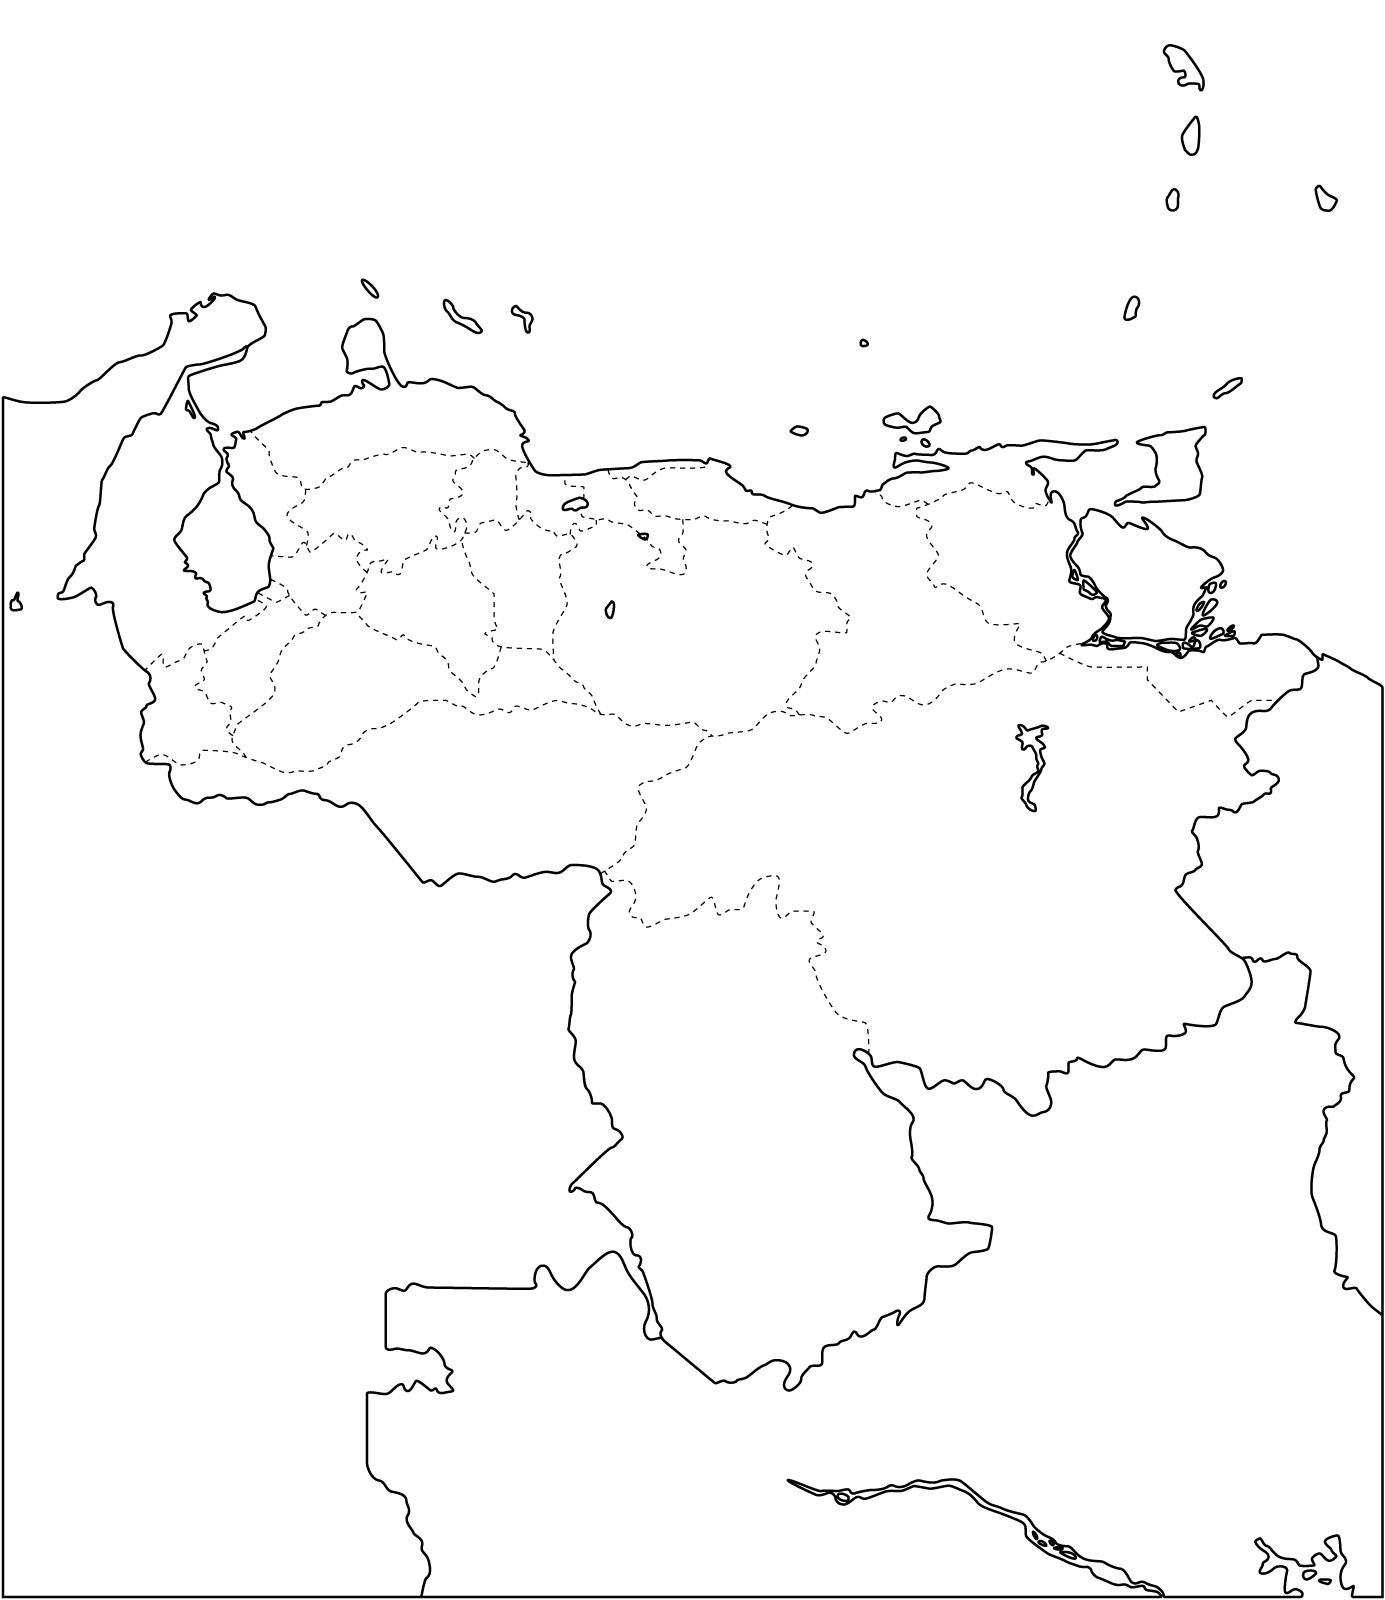 Mapa político mudo de Venezuela para imprimir Mapa de estados de ...